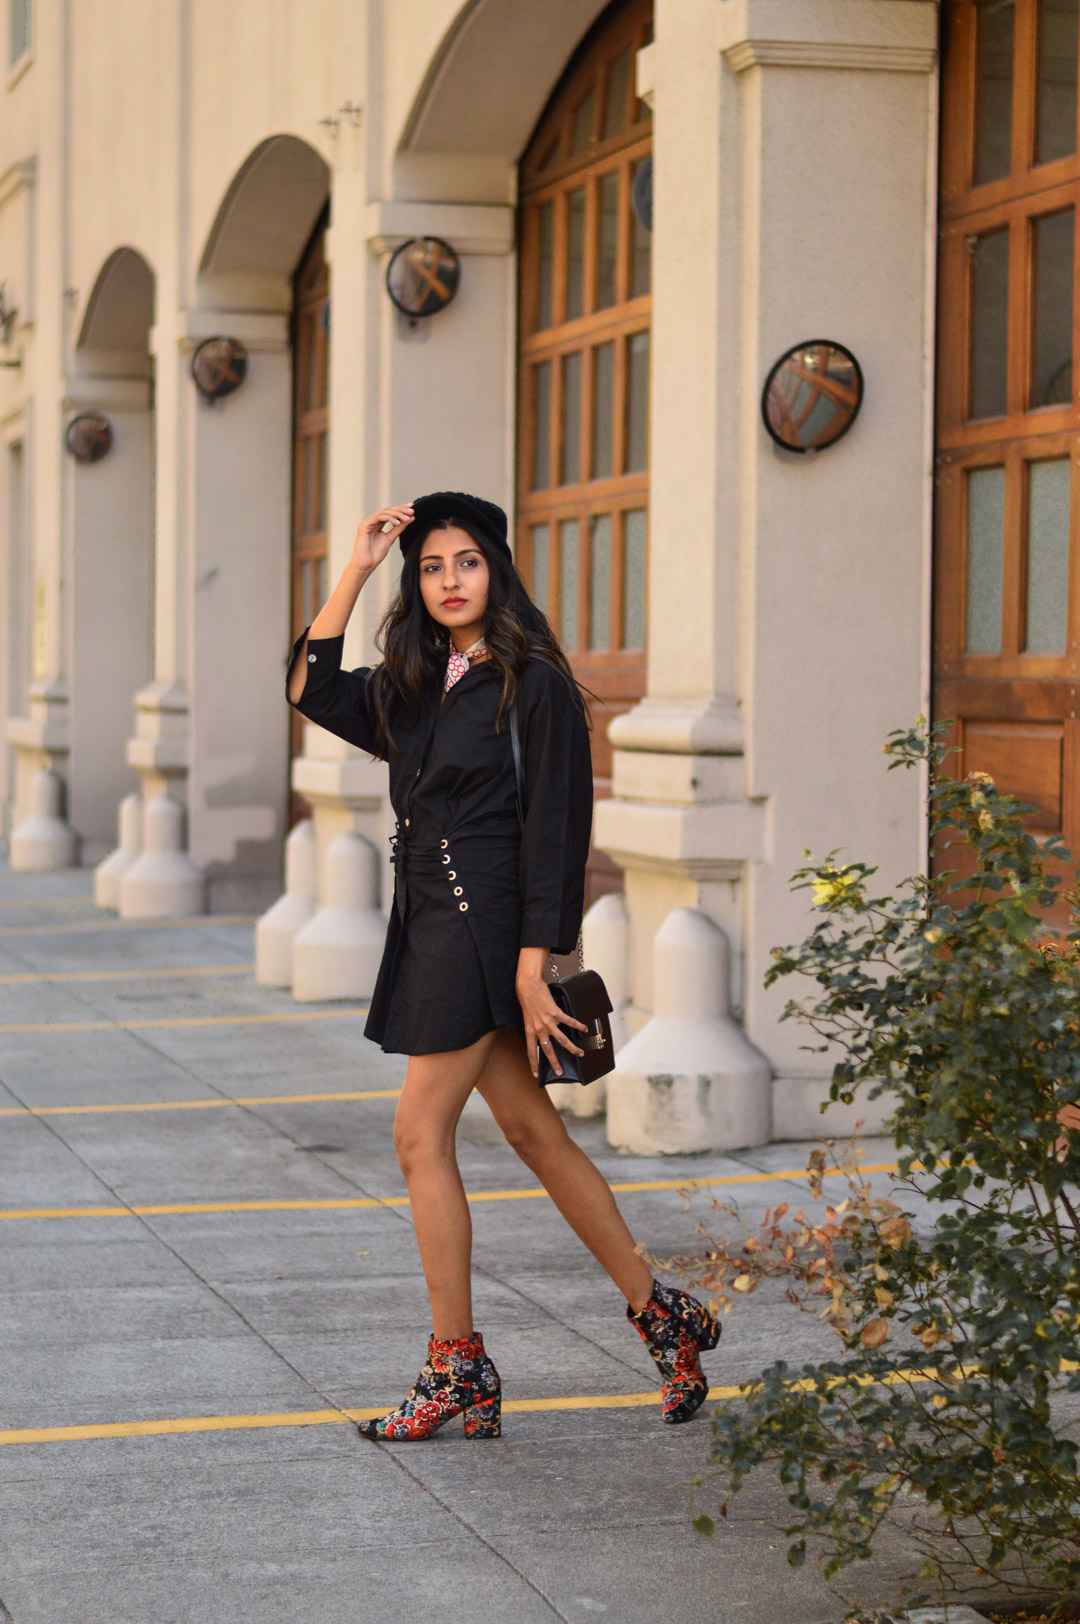 corset-detail-shirtdress-silk-scarf-blogger-outfit 7